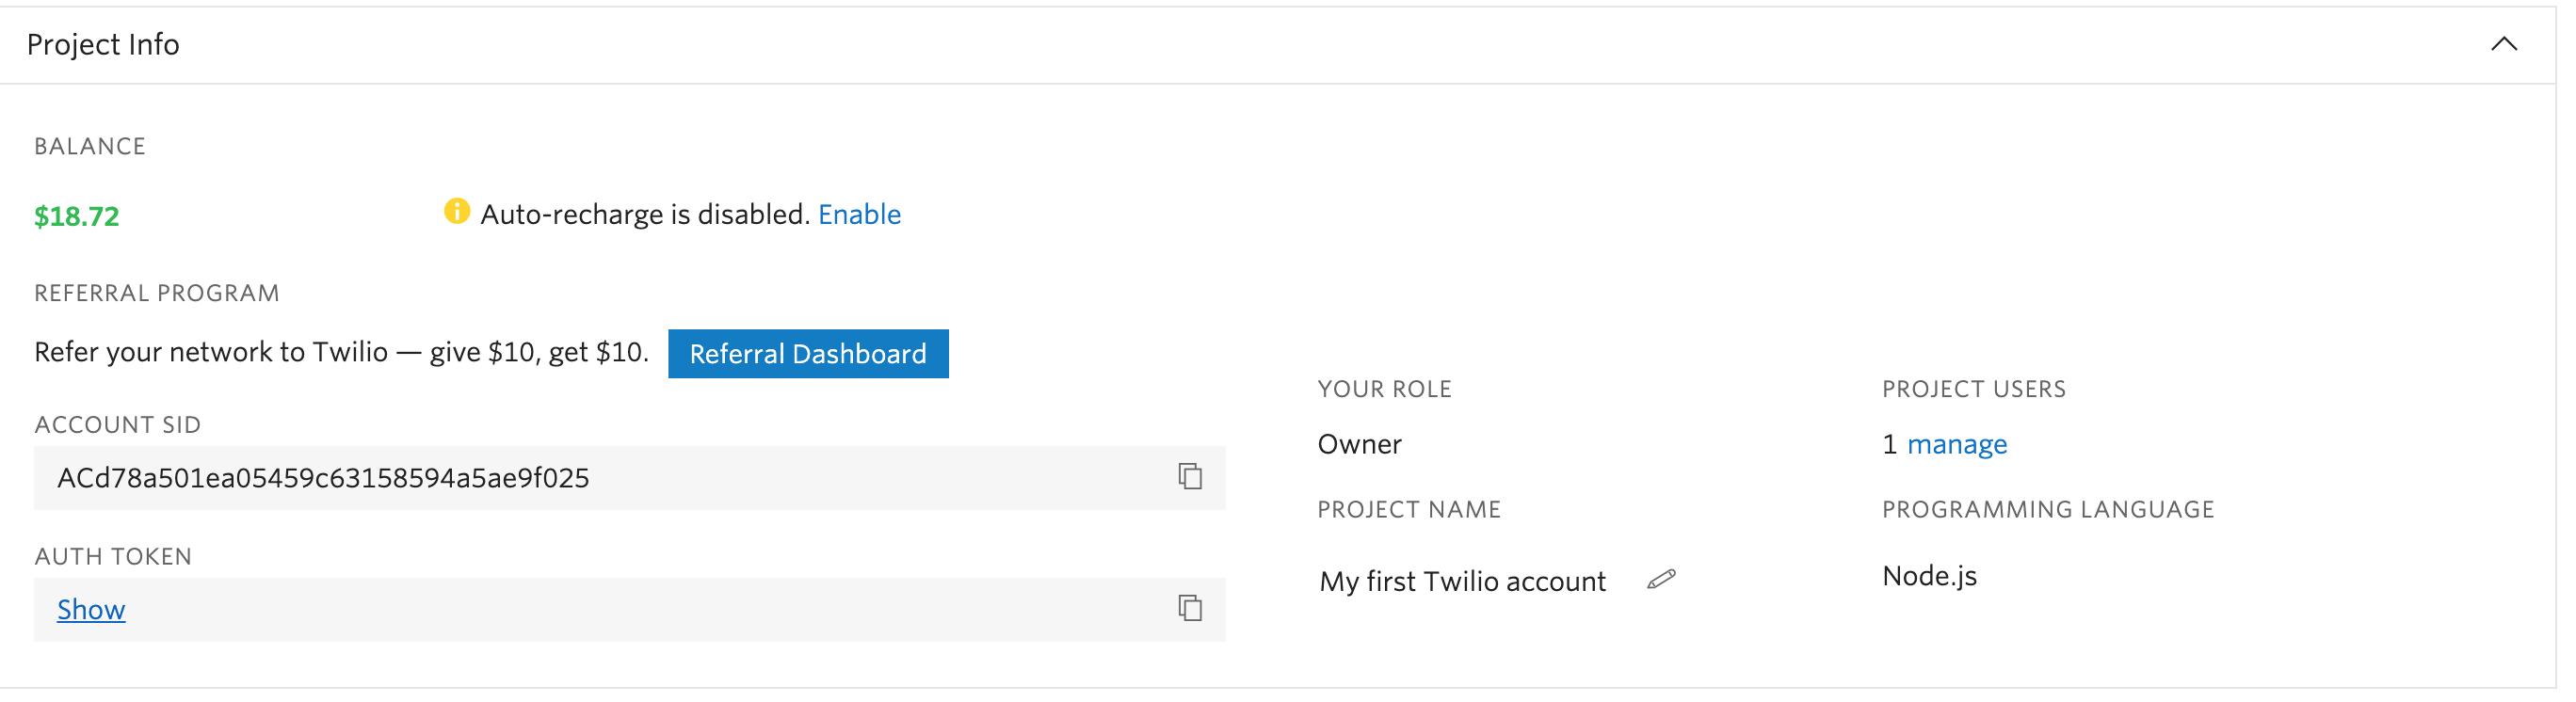 Twilio Integration image